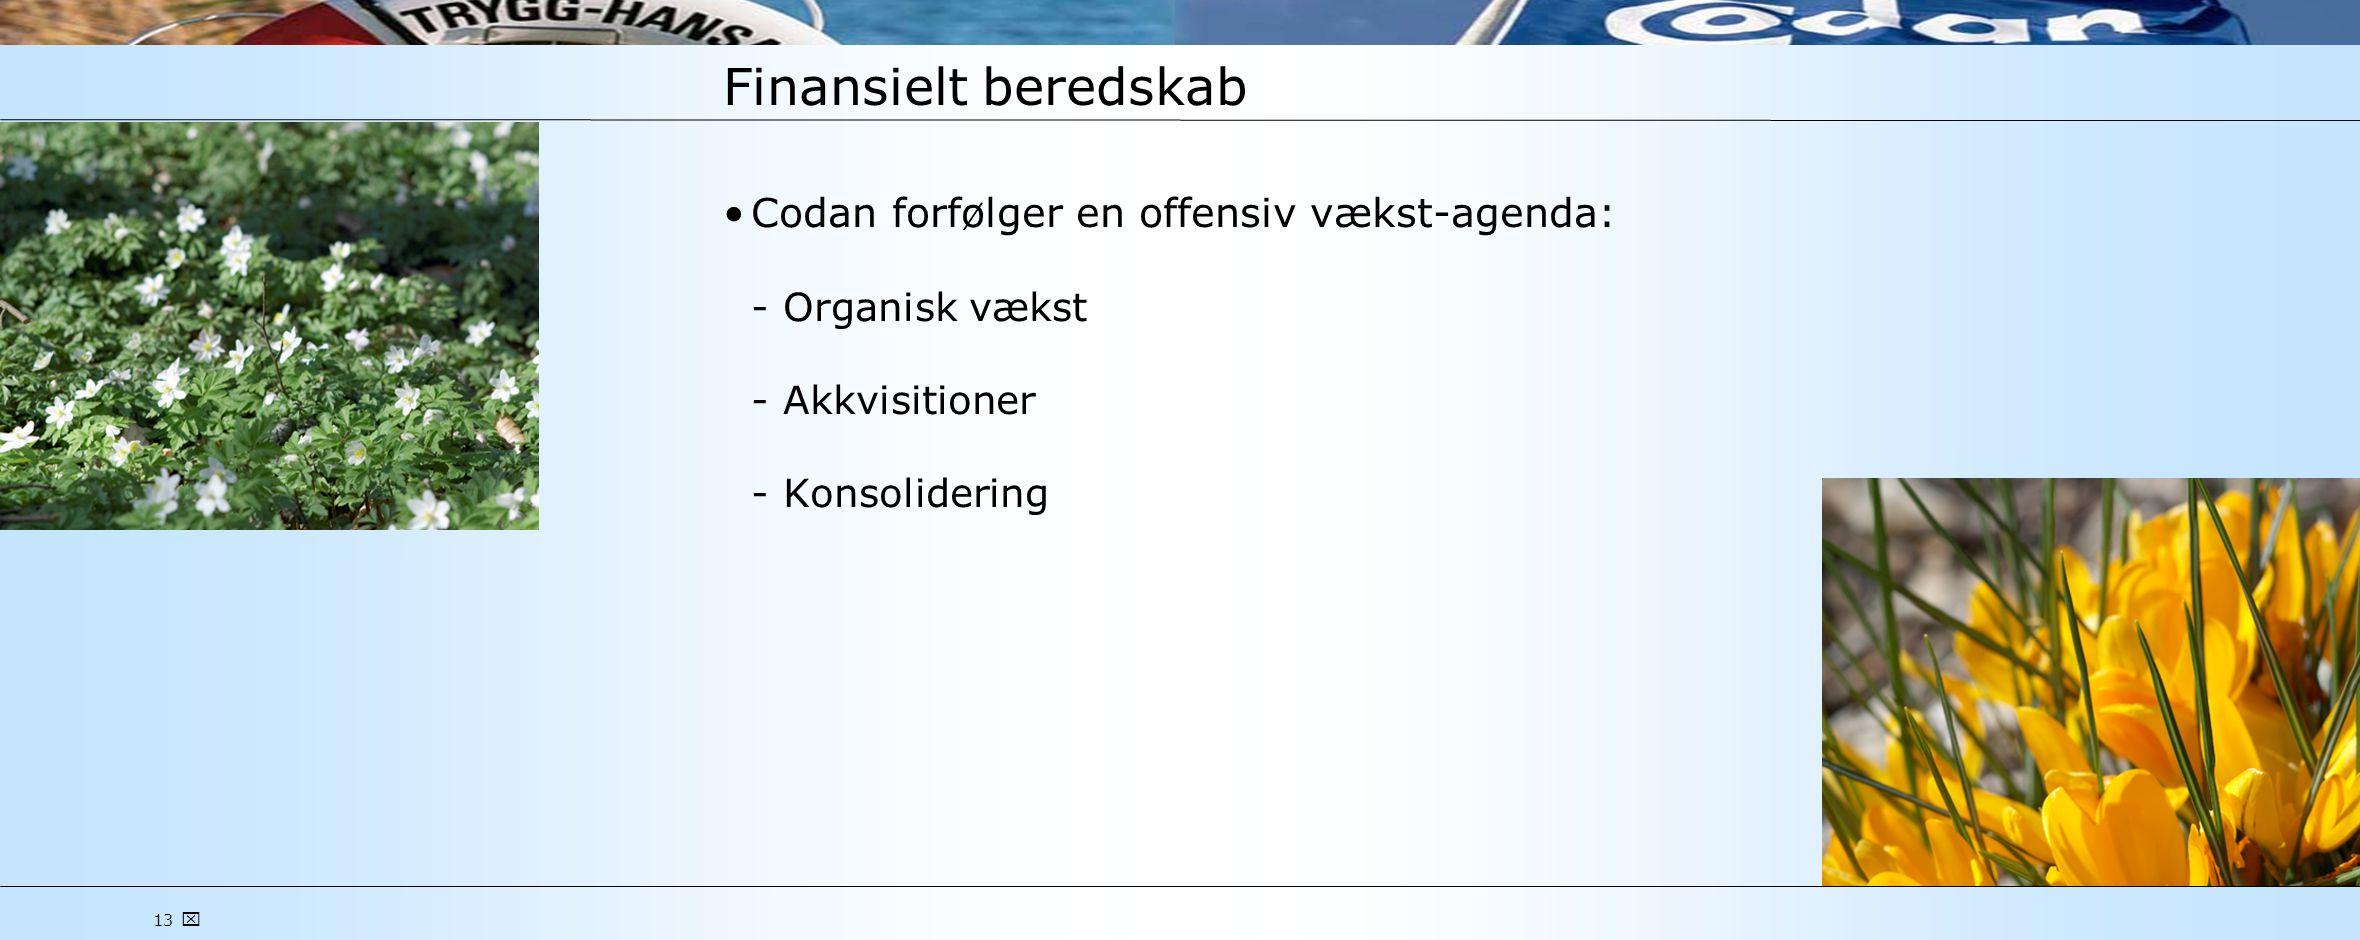 13  Finansielt beredskab •Codan forfølger en offensiv vækst-agenda: Organisk vækst Akkvisitioner Konsolidering